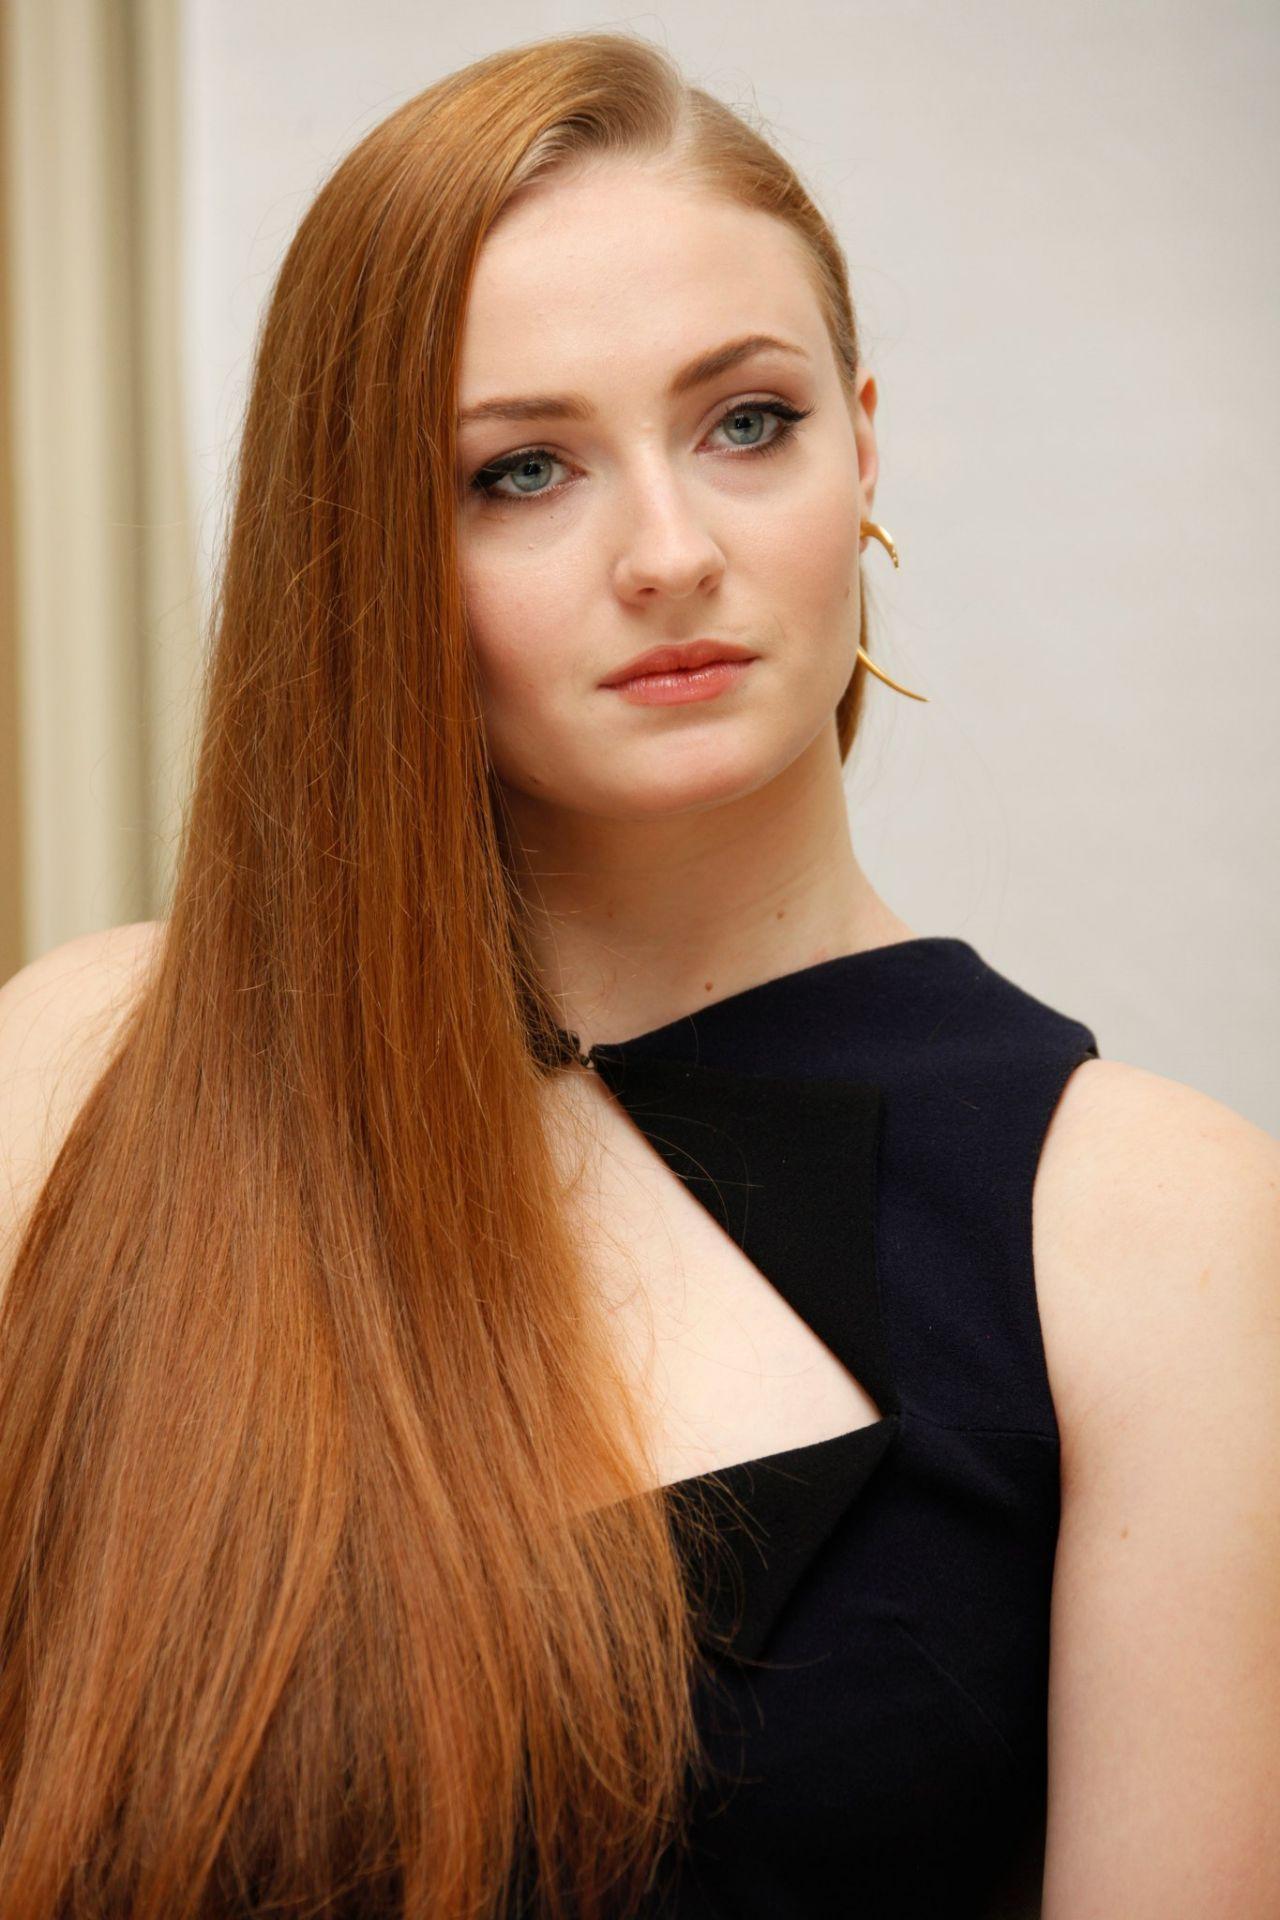 Zoe Hunter Lee